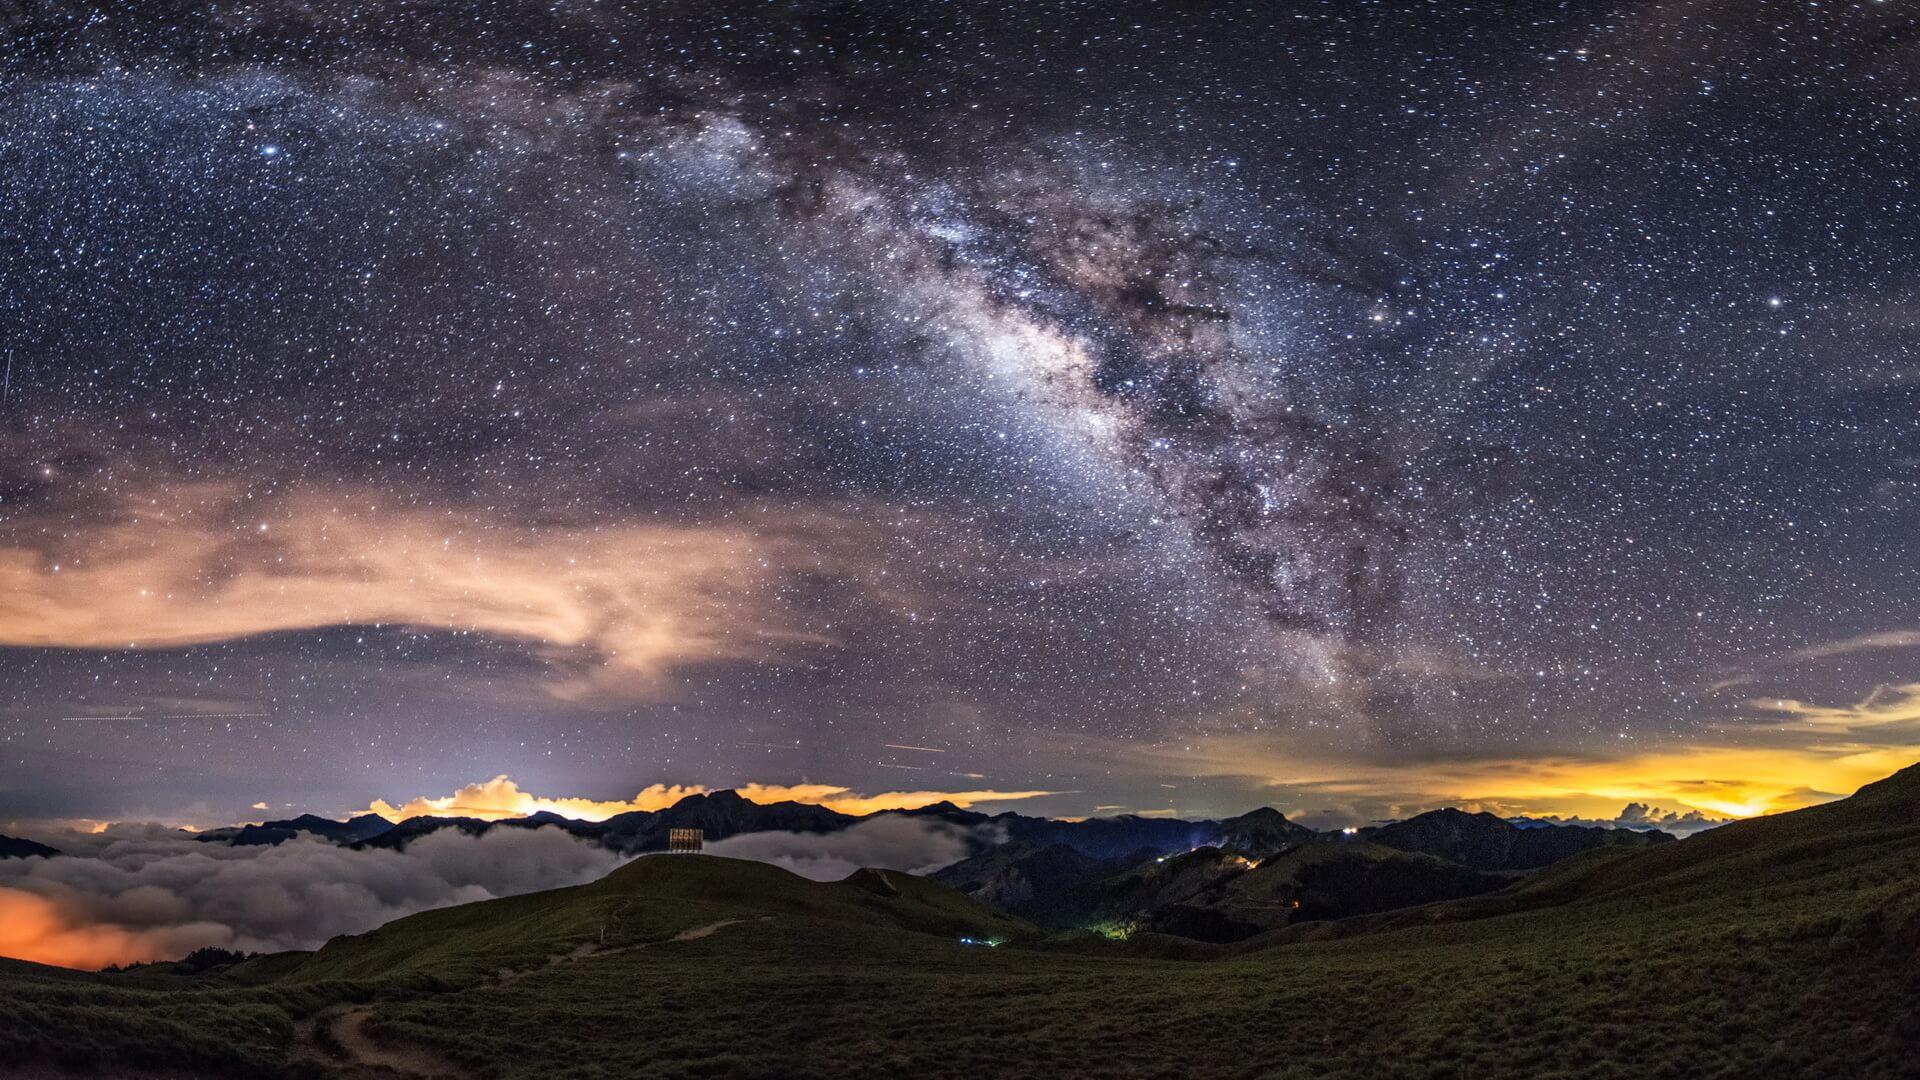 How to photograph Hokunohoaupuni The Milky Way in Hawaii